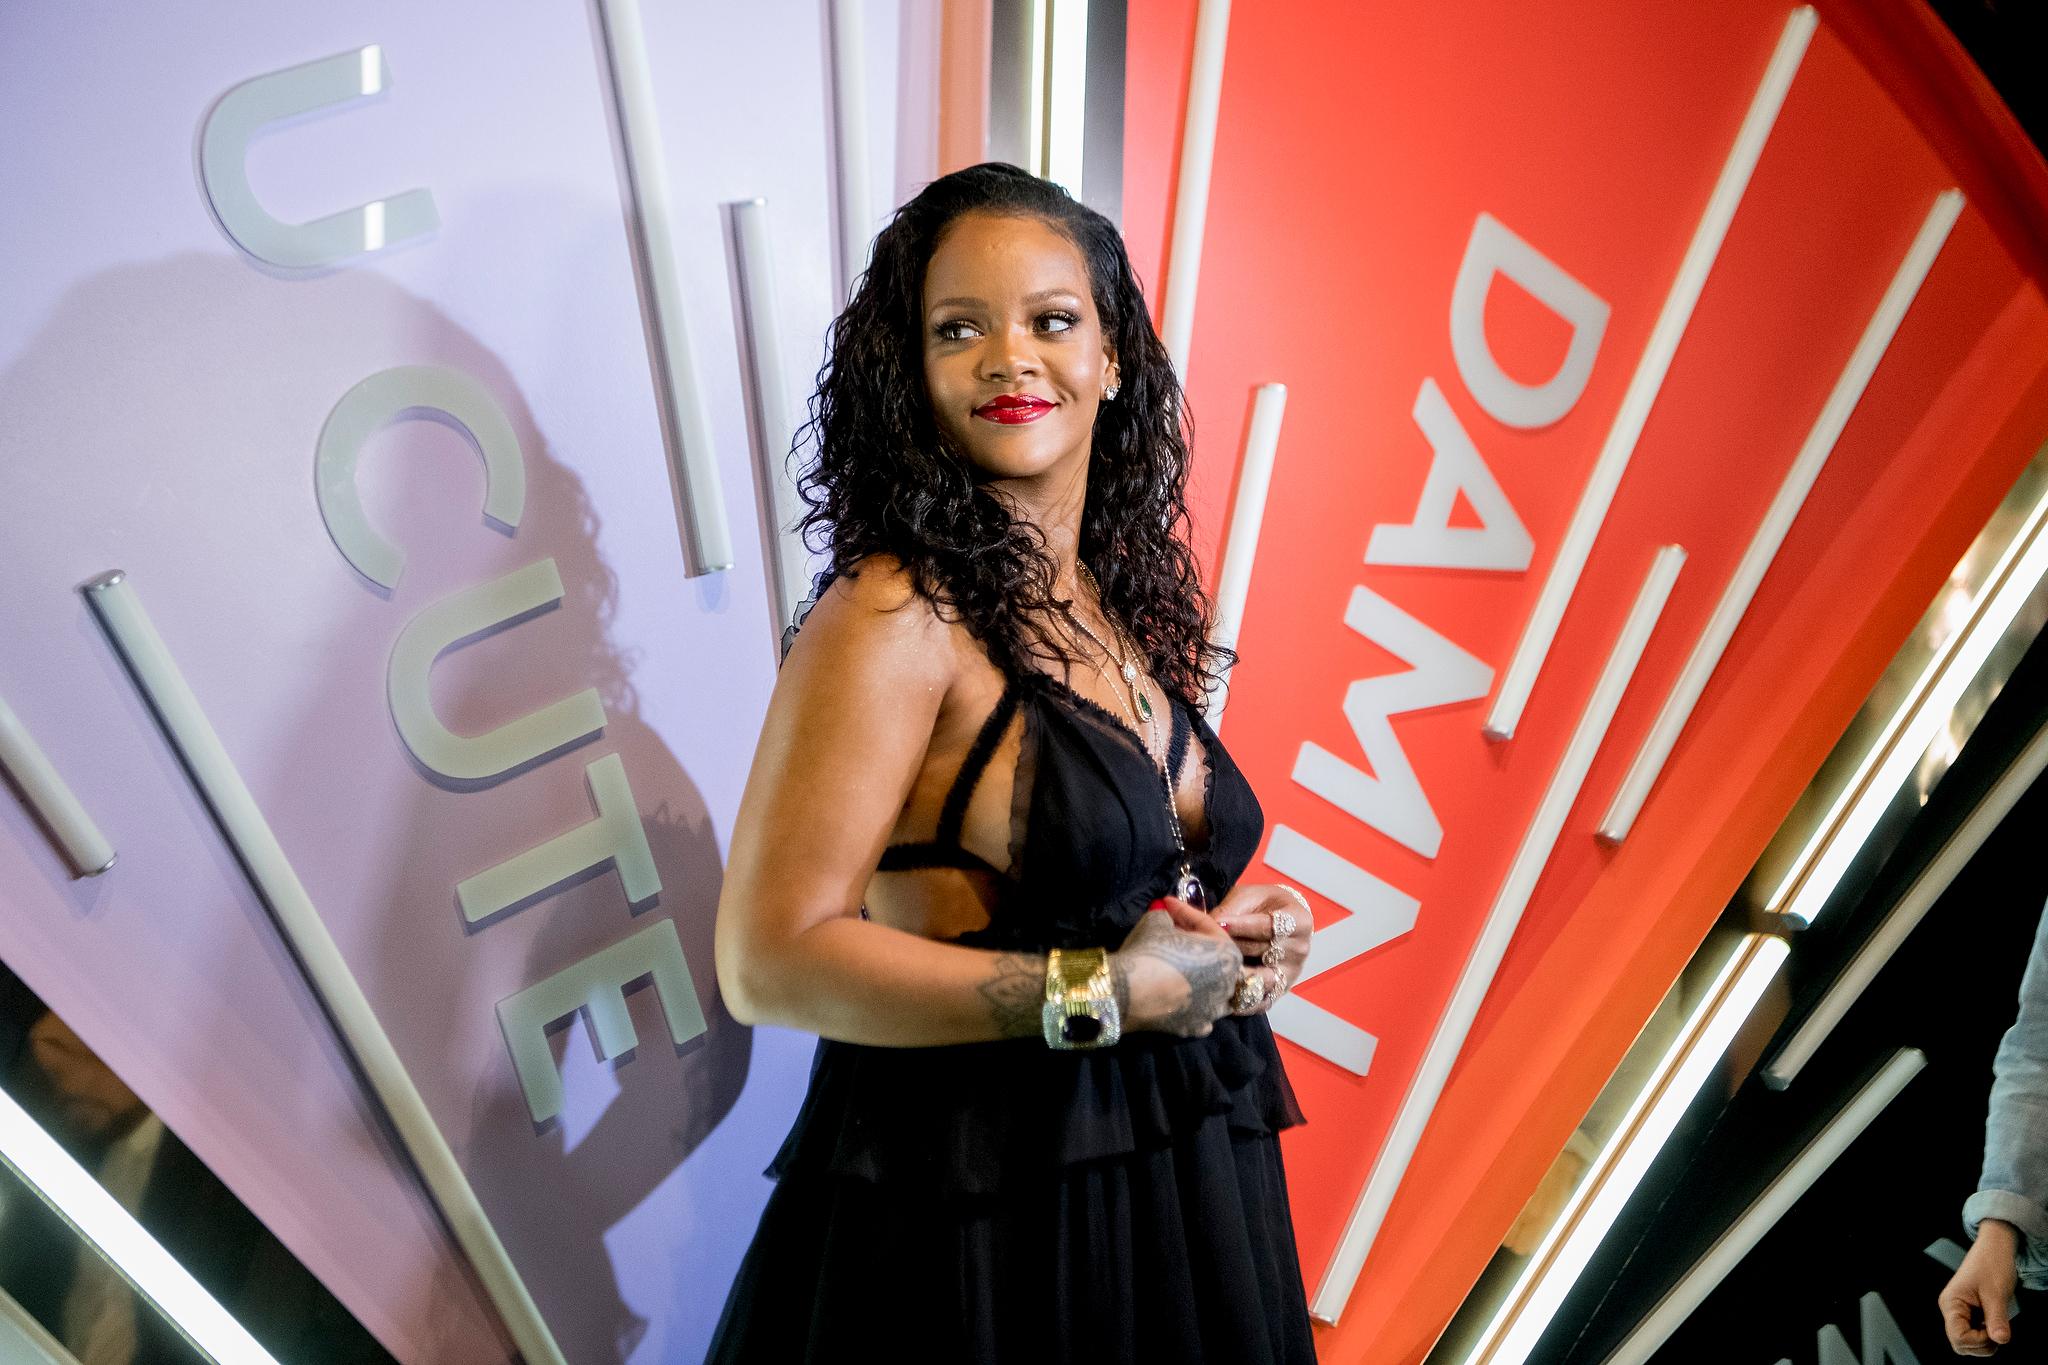 Rihanna at Savage x Fenty launch